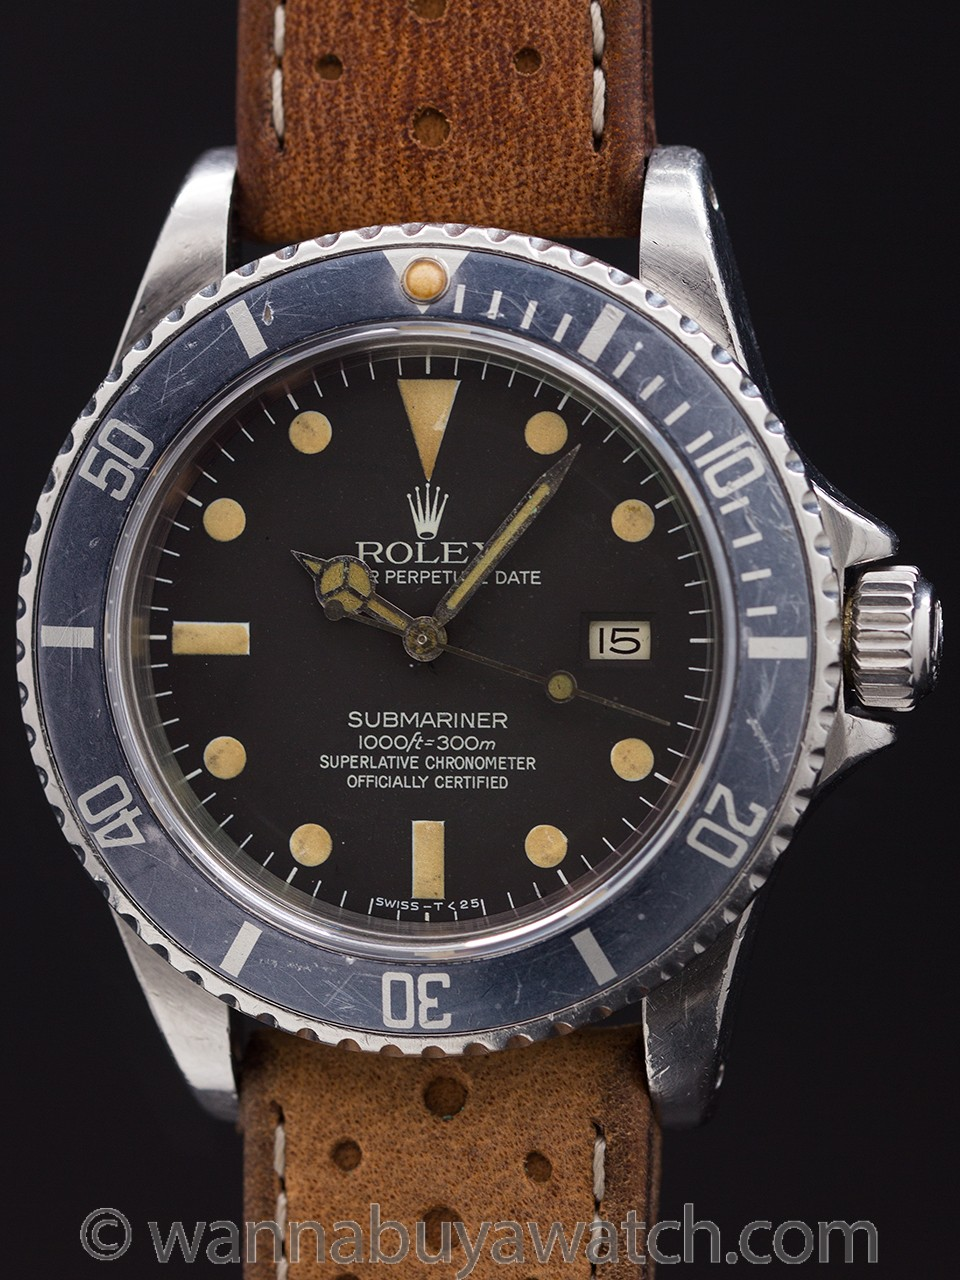 Rolex Submariner ref 16800 Transitional MK III Dial circa 1981